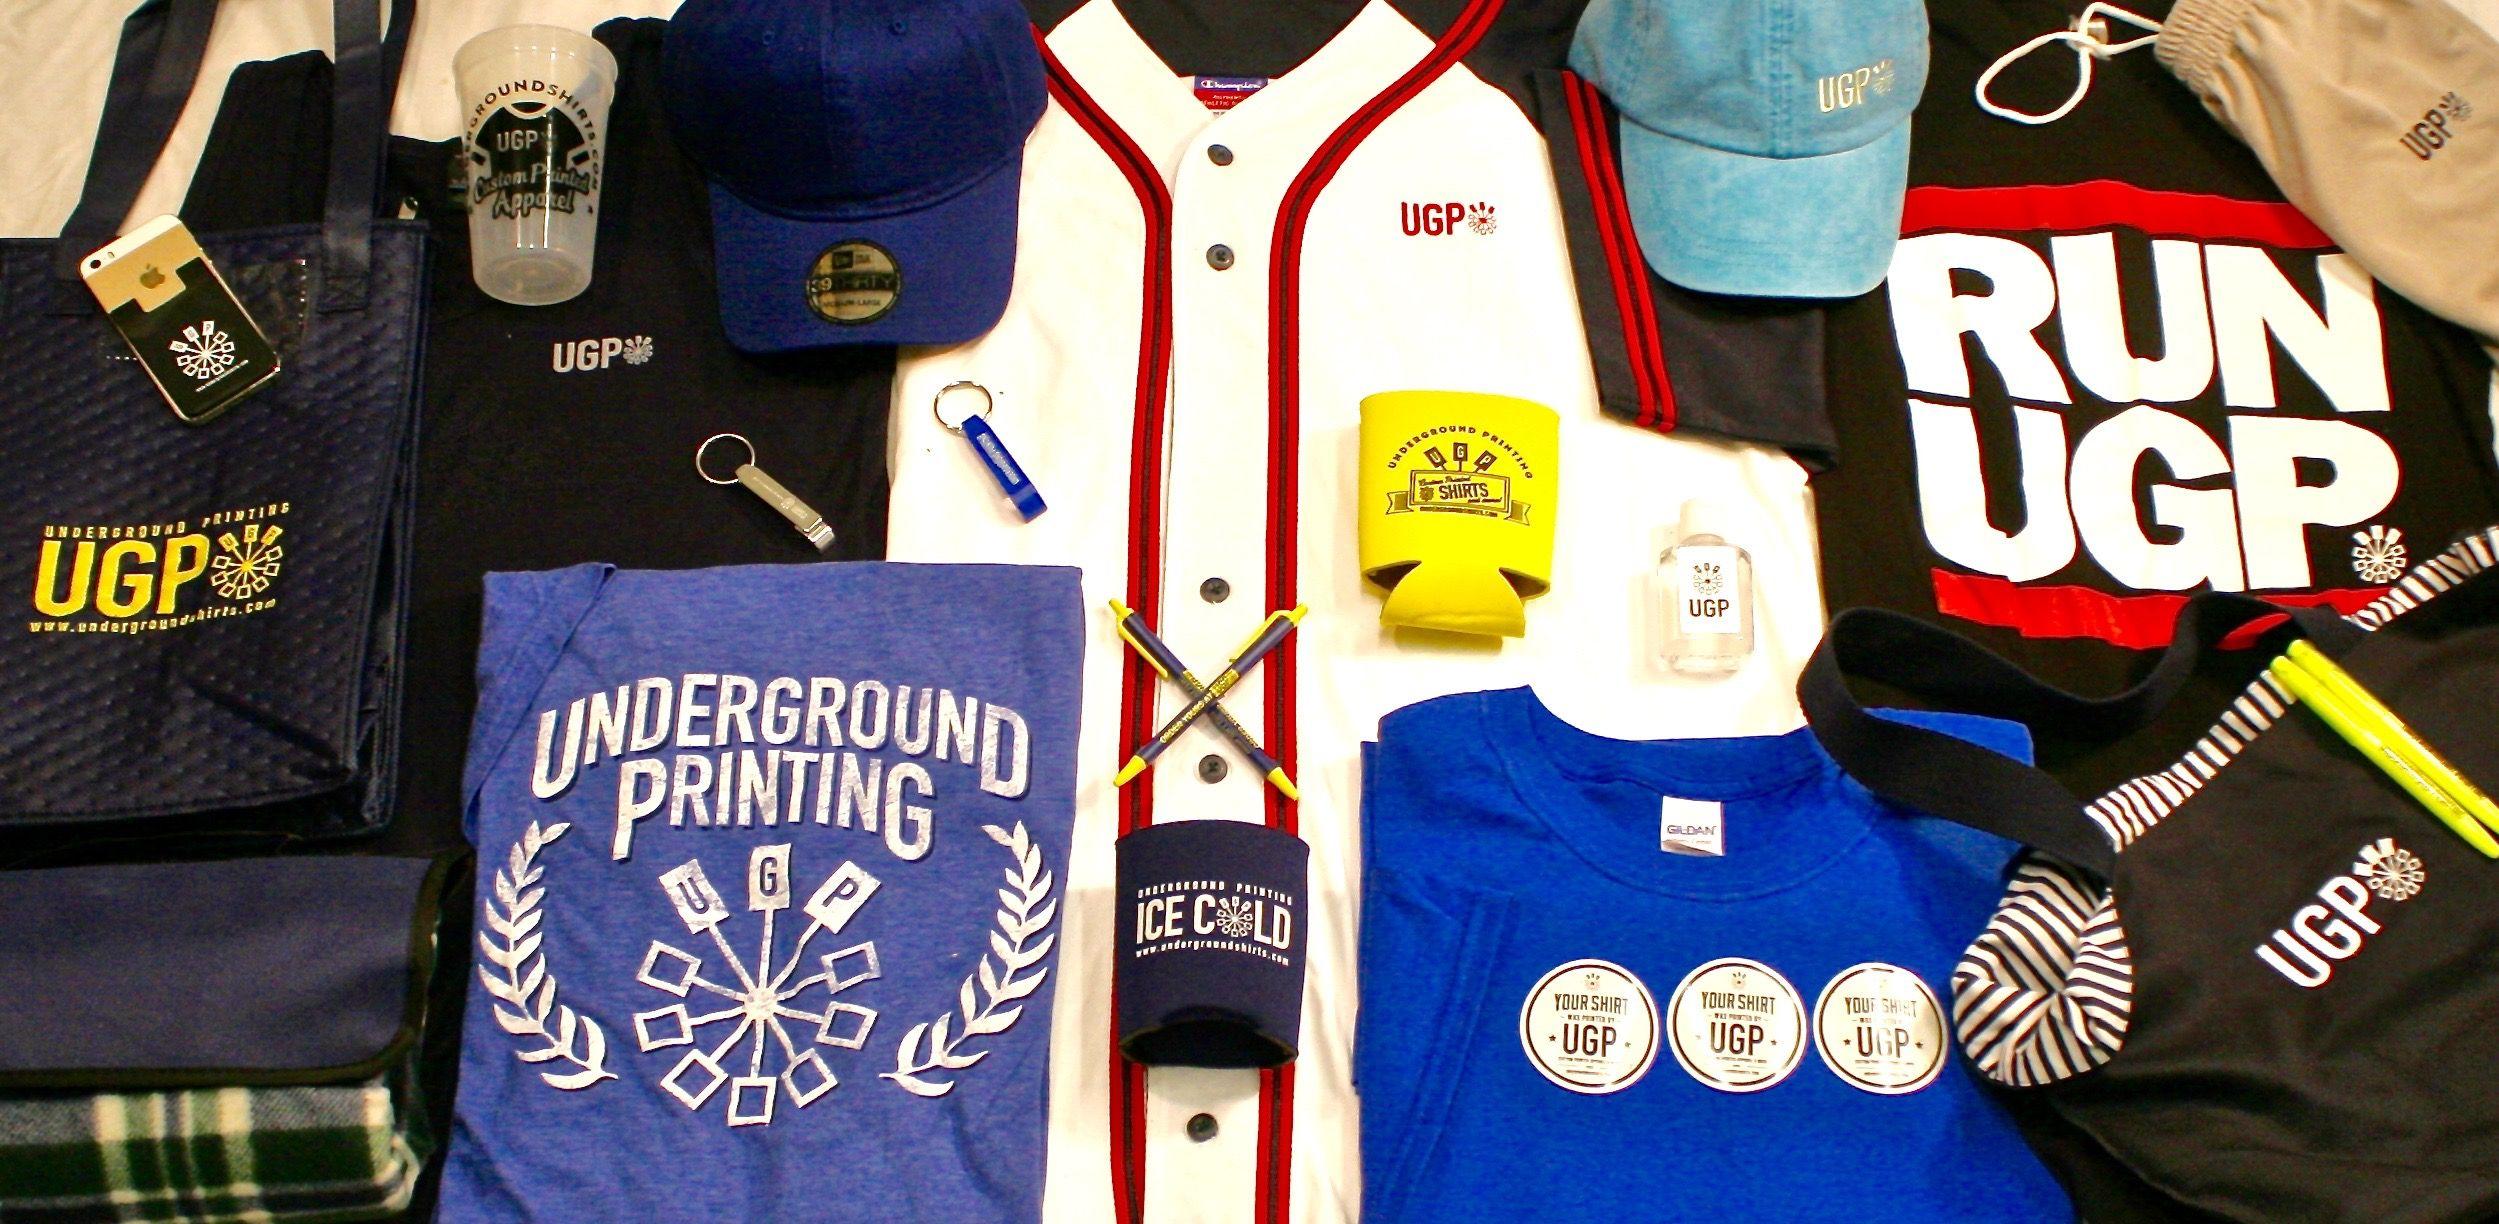 a9c18a7f6 We print custom shirts & #MORE. #screenprinting #digitalprint #promo  #products #business #swag #custom